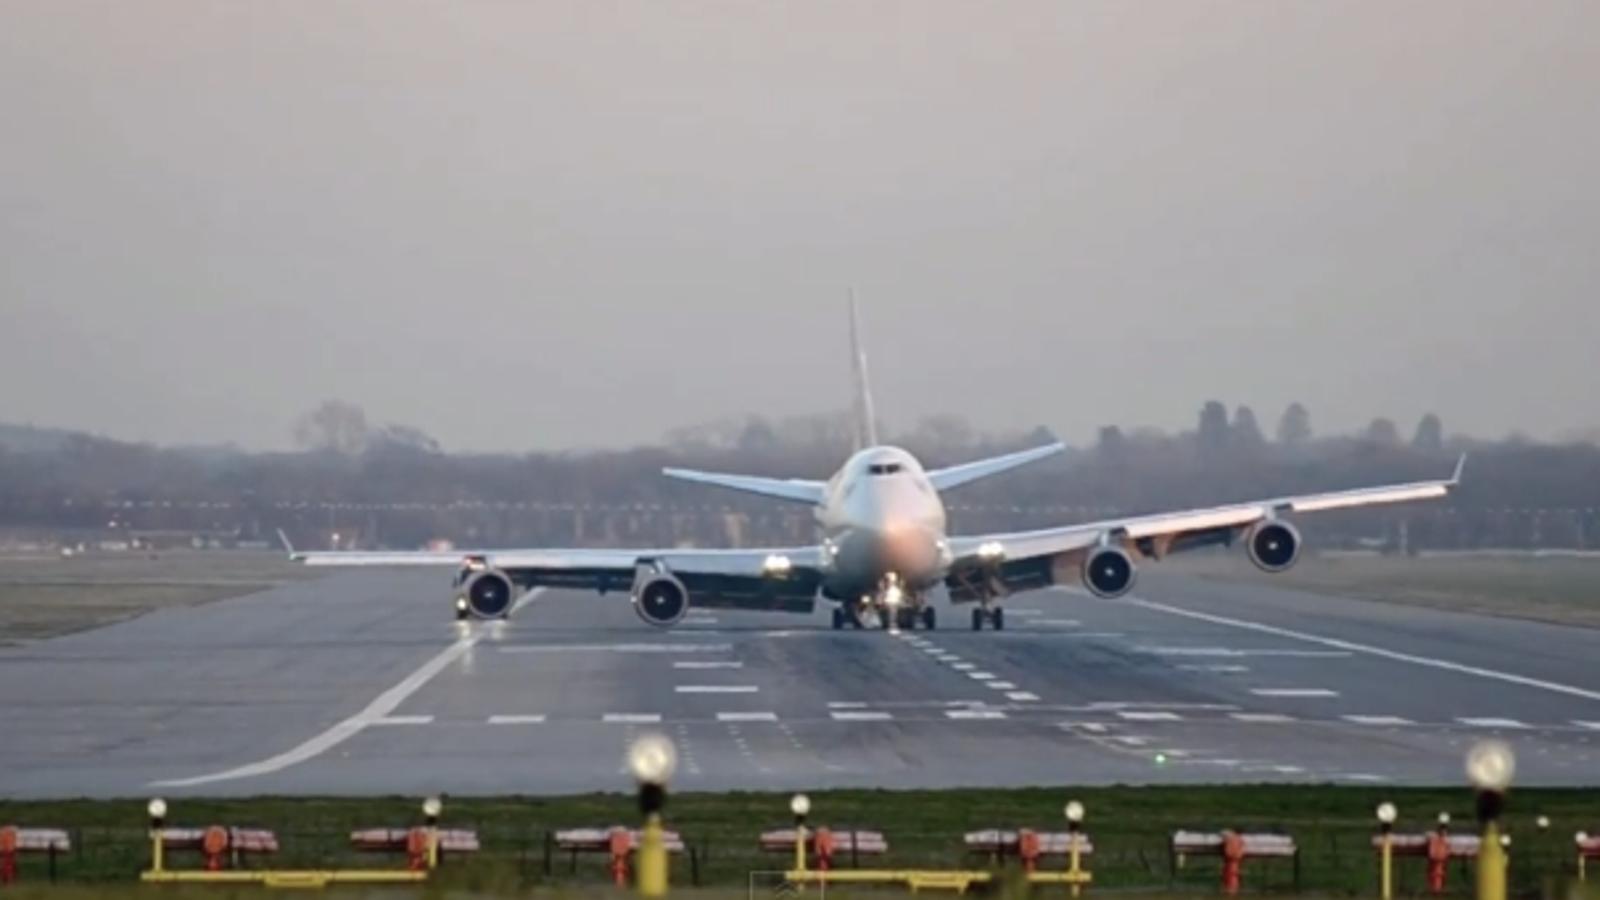 Un Boeing 747 aterriza de emergencia sin un tren de aterrizaje